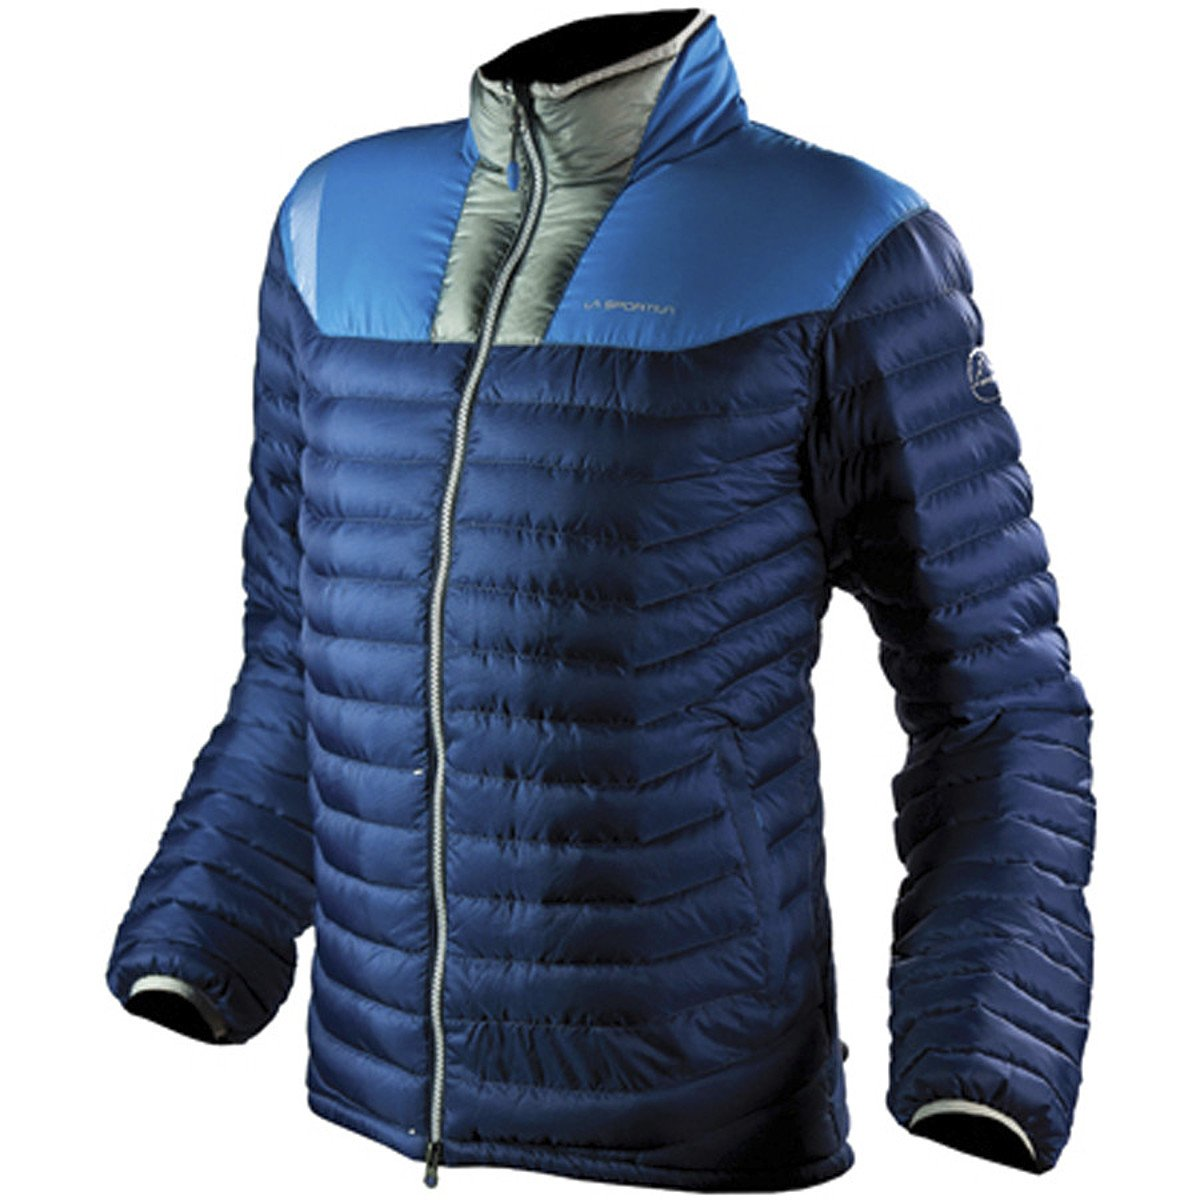 Amazon.com: La Sportiva Zoid Down Jacket - Men's Navy Blue Medium ...